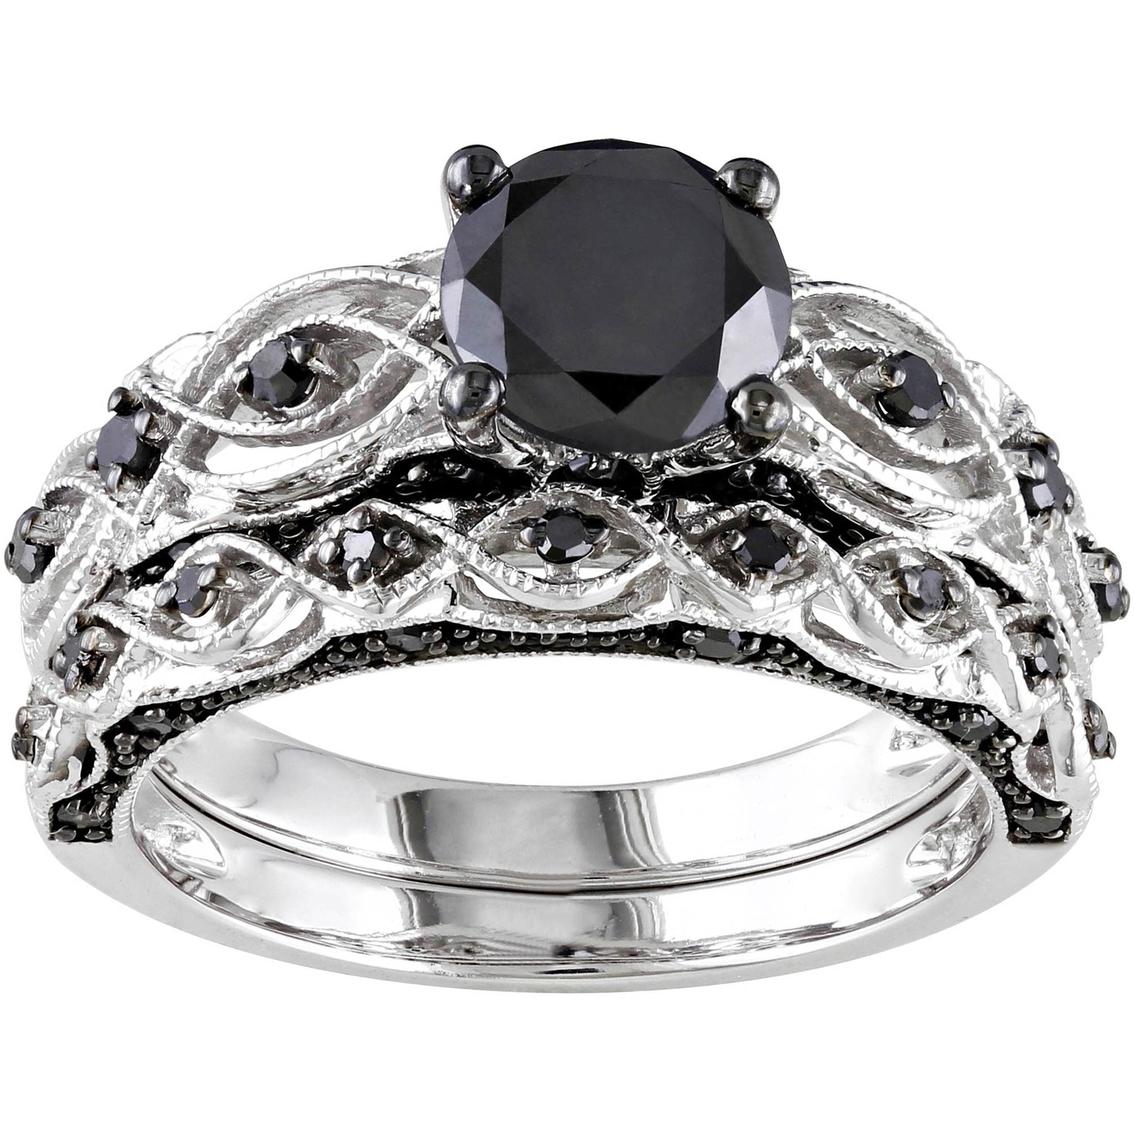 Diamore 10k White Gold 1 3 8 Ctw Black Diamond Vintage Bridal Set